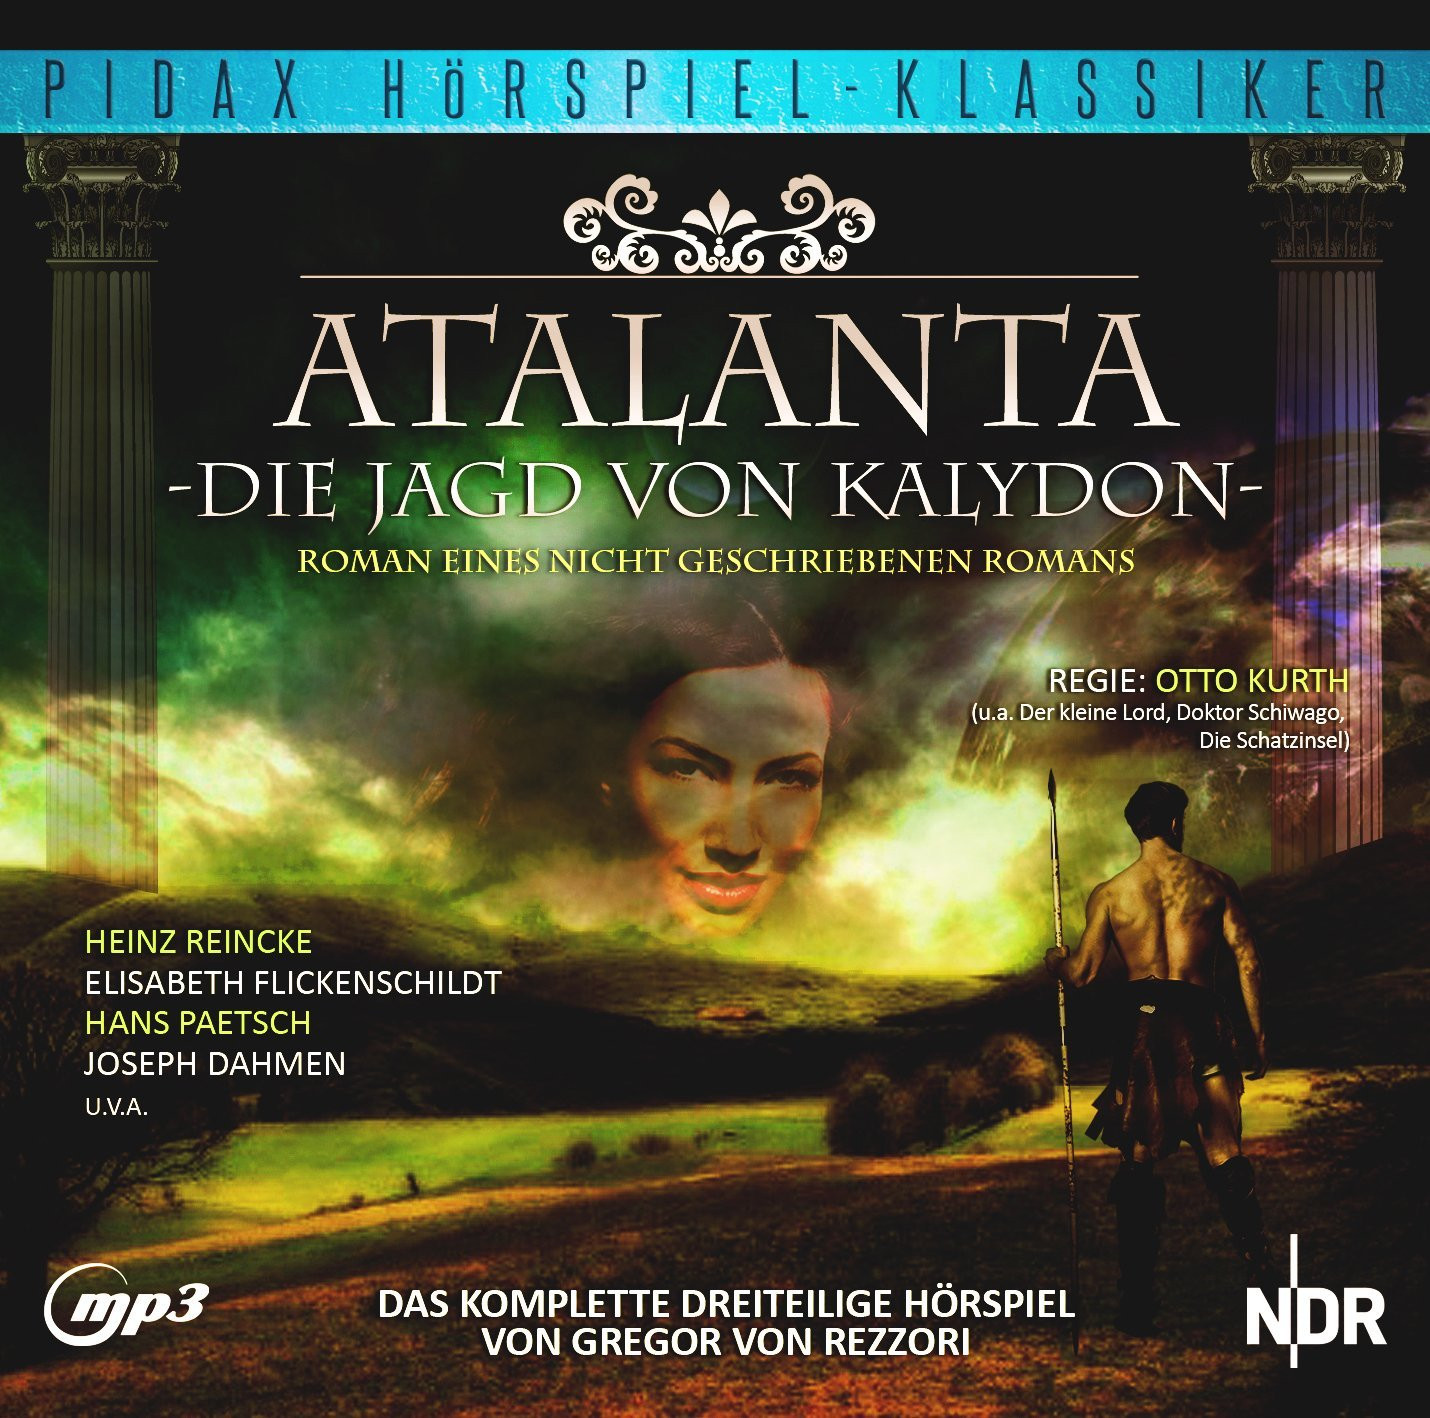 Pidax Hörspiel Klassiker - Atalanta